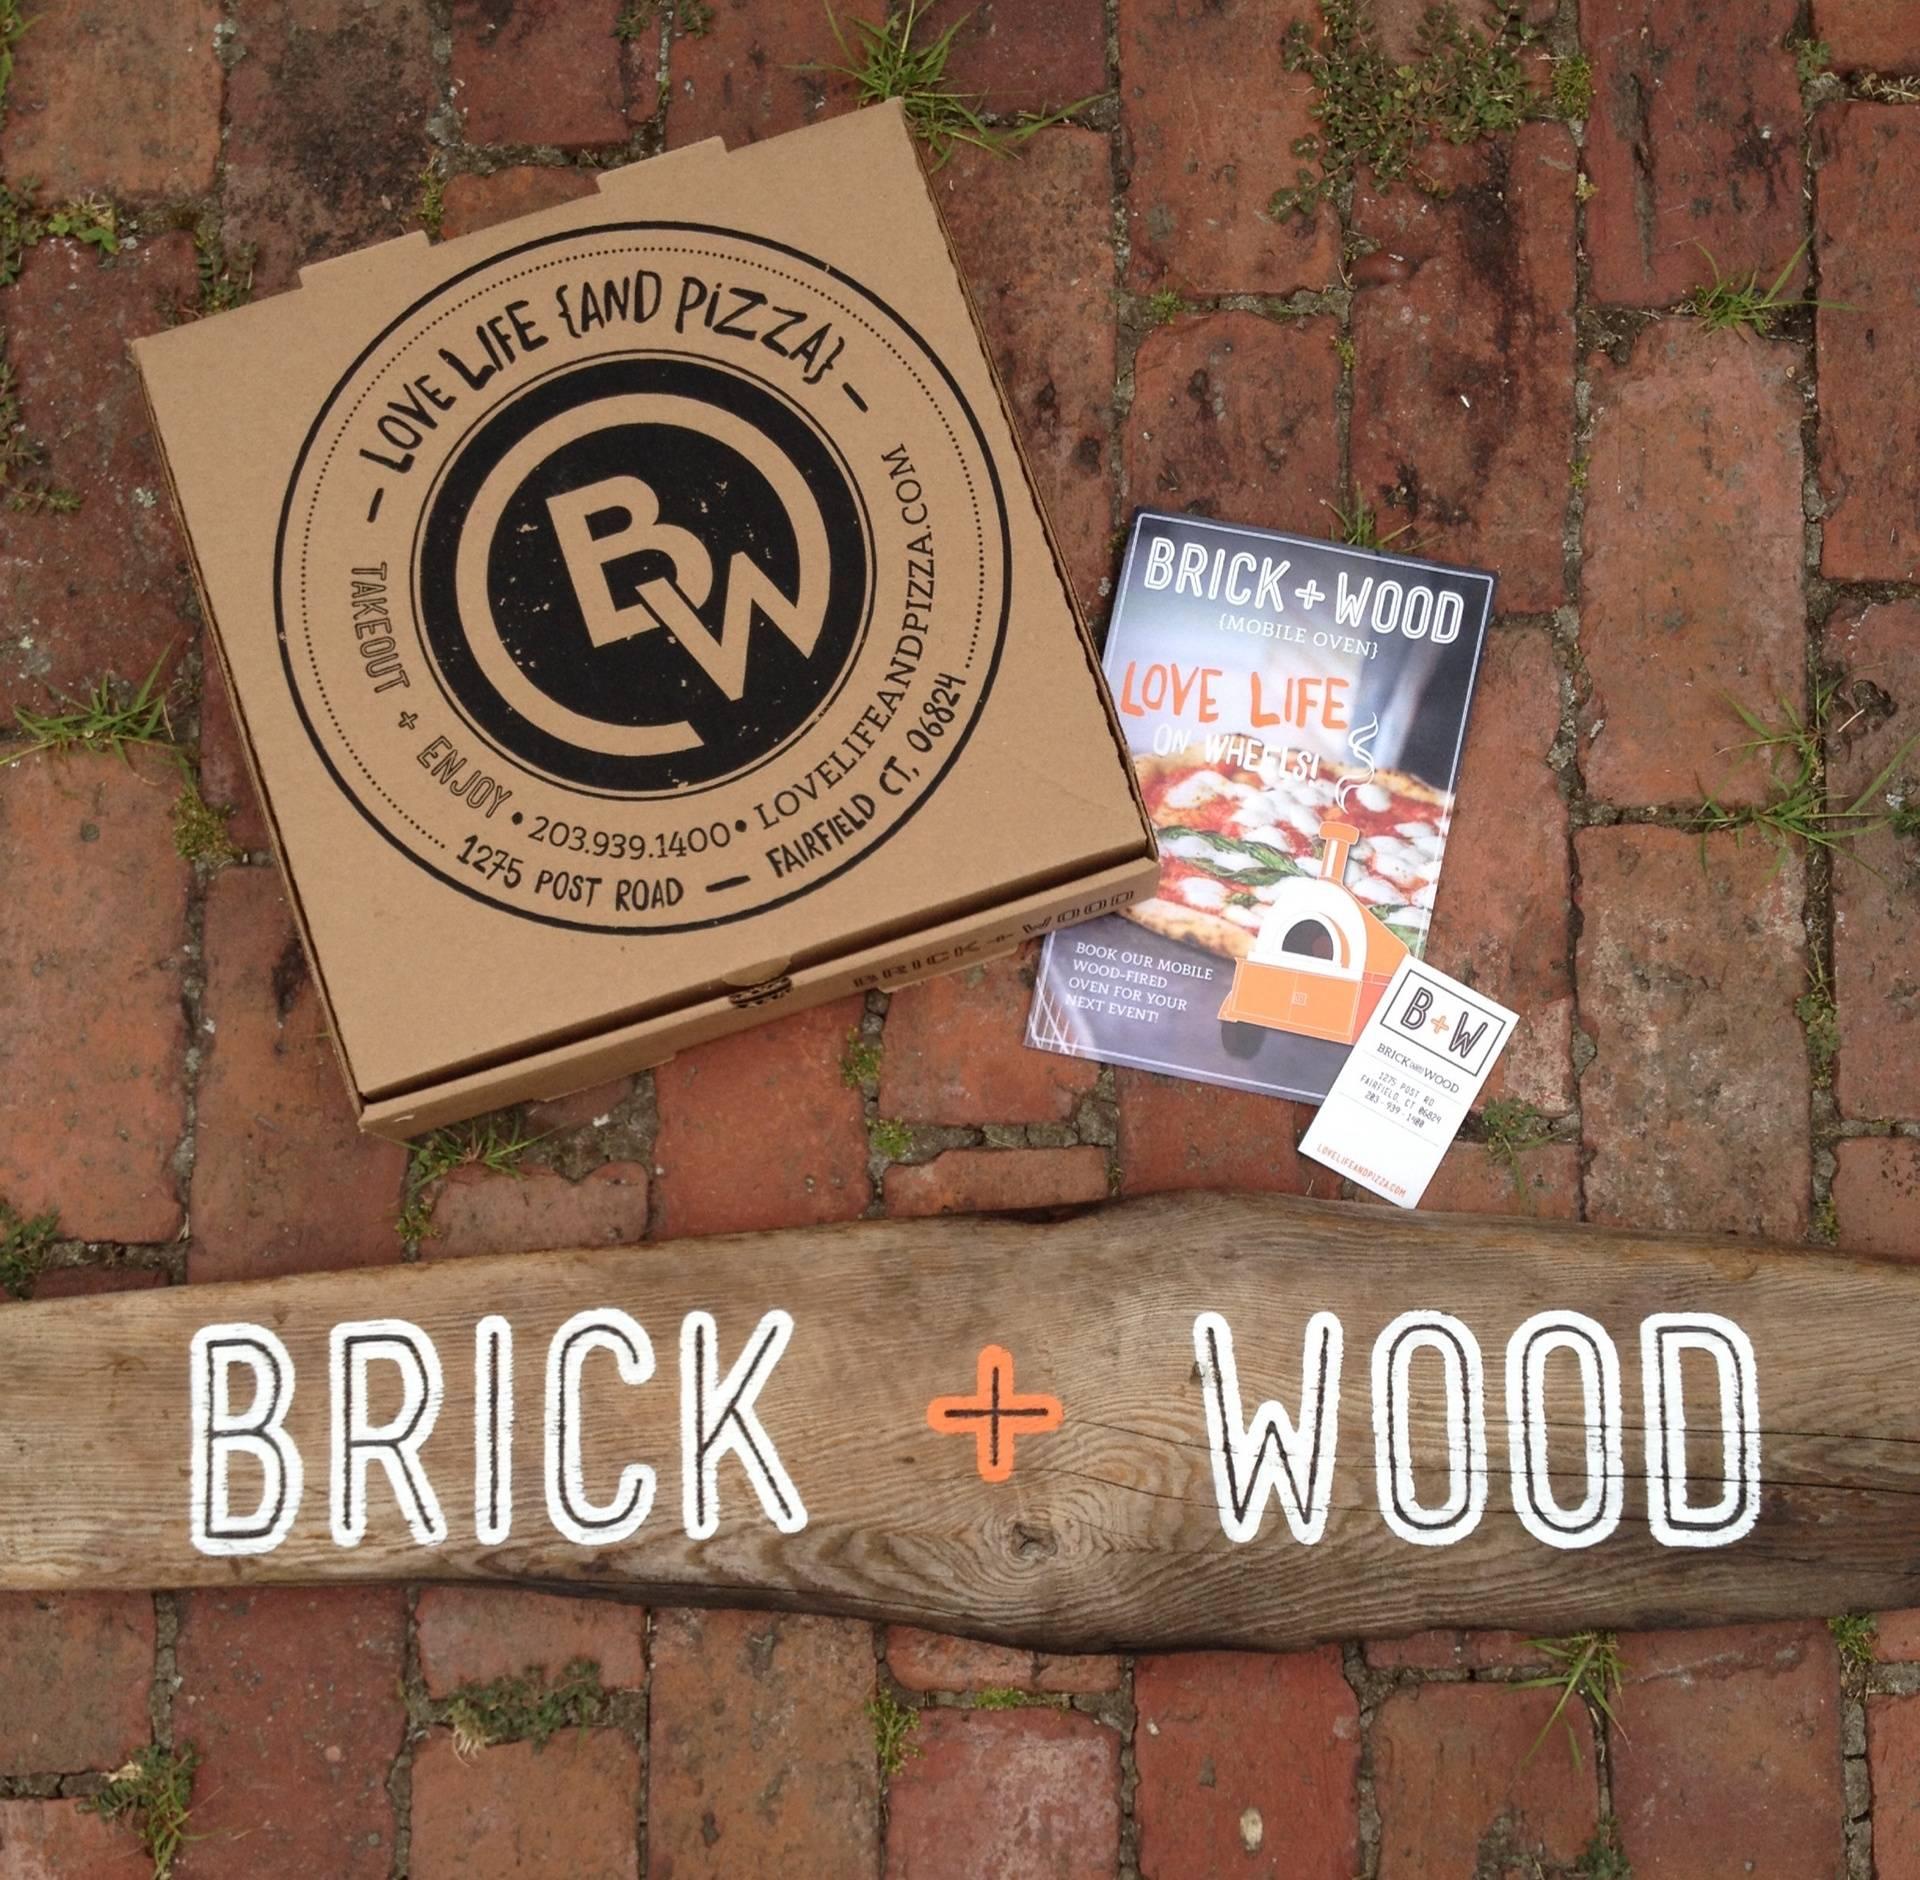 Brick + Wood in Fairfield, CT